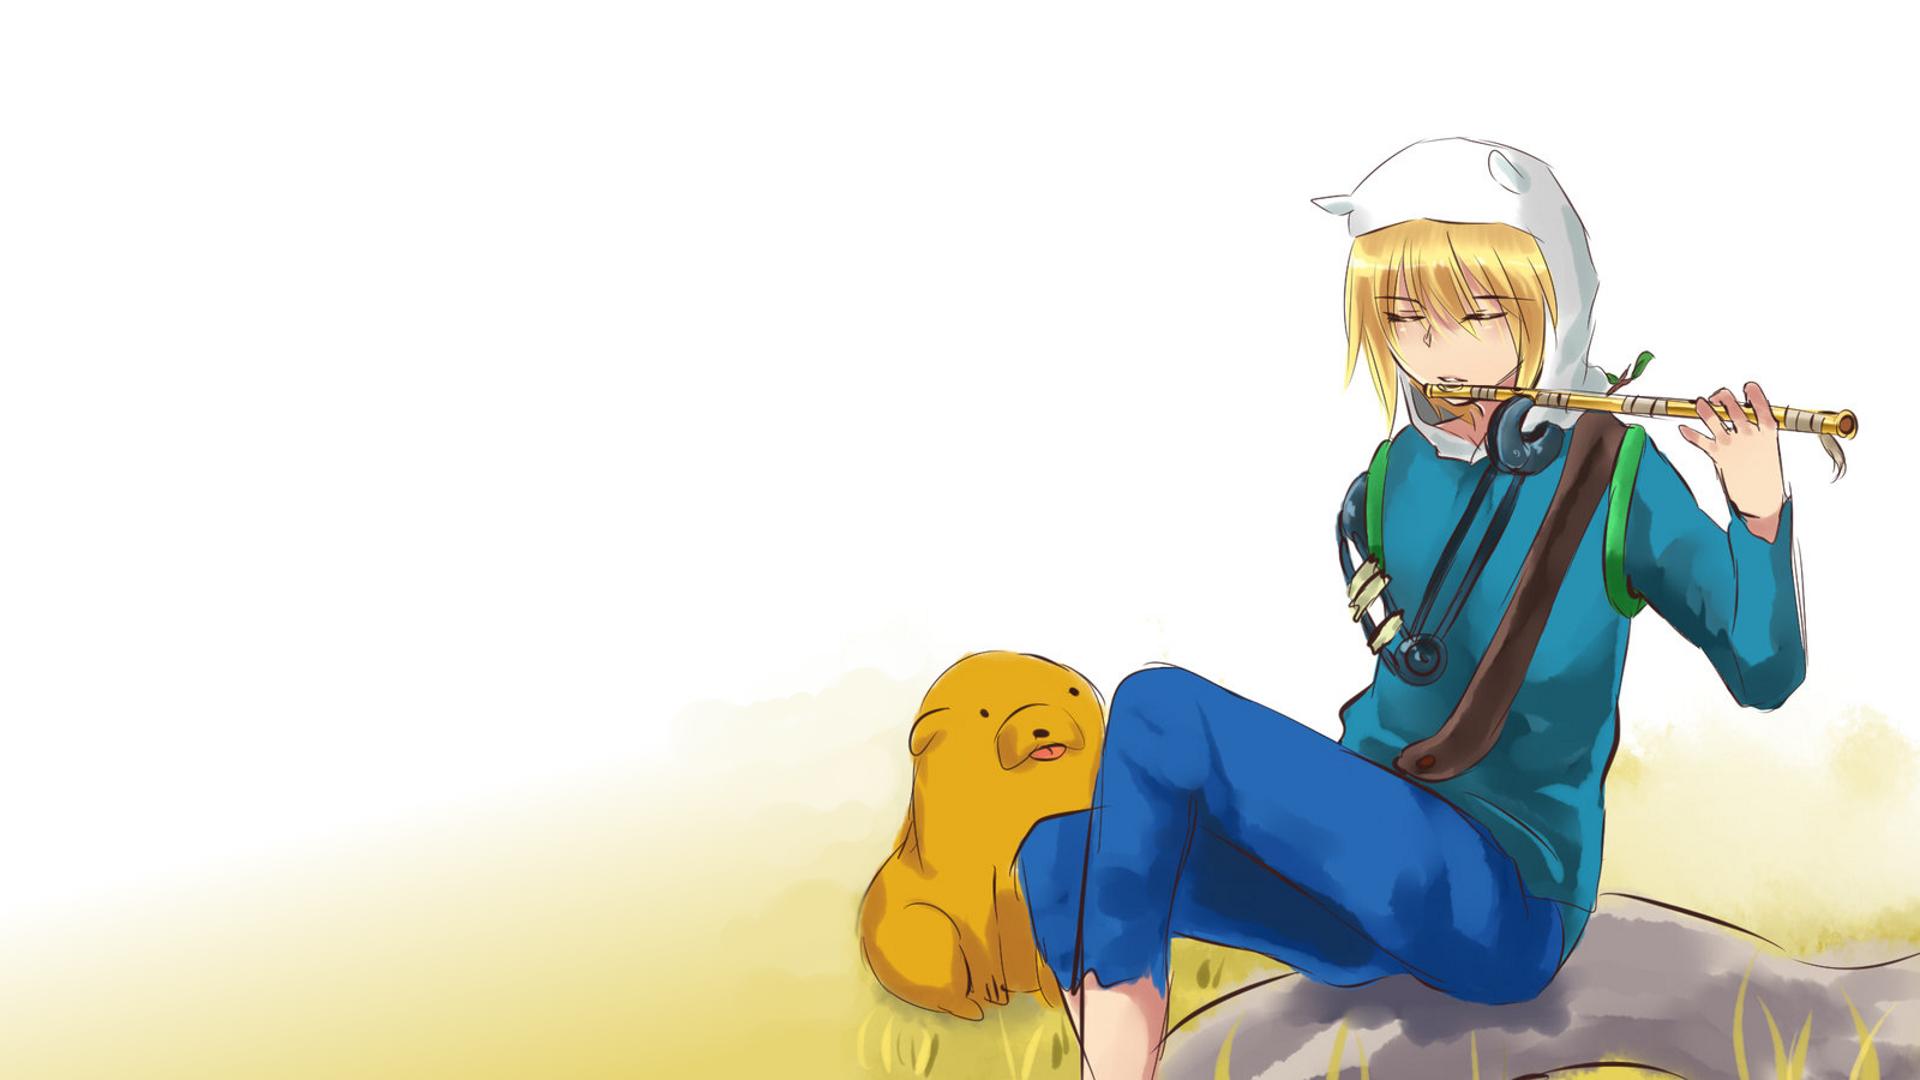 Wallpaper Adventure Time Finn The Human Jake The Dog Anime